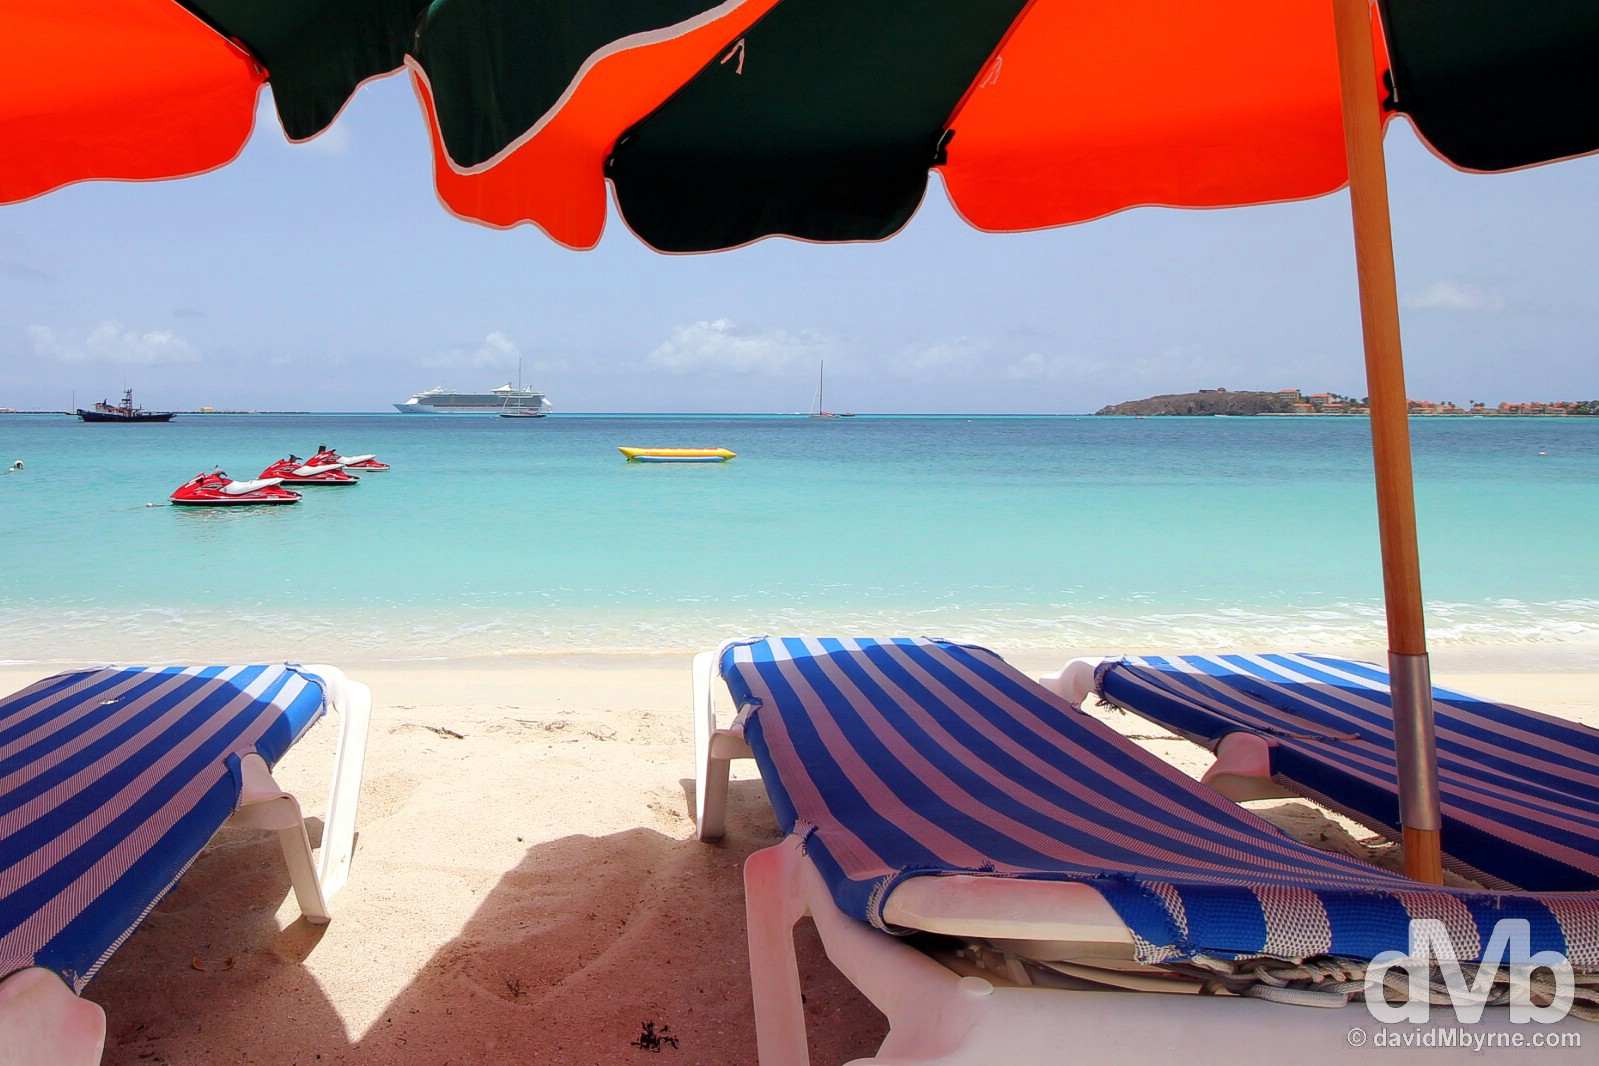 The beach in Philipsburg, Sint Maarten, Lesser Antilles. June 8, 2015.